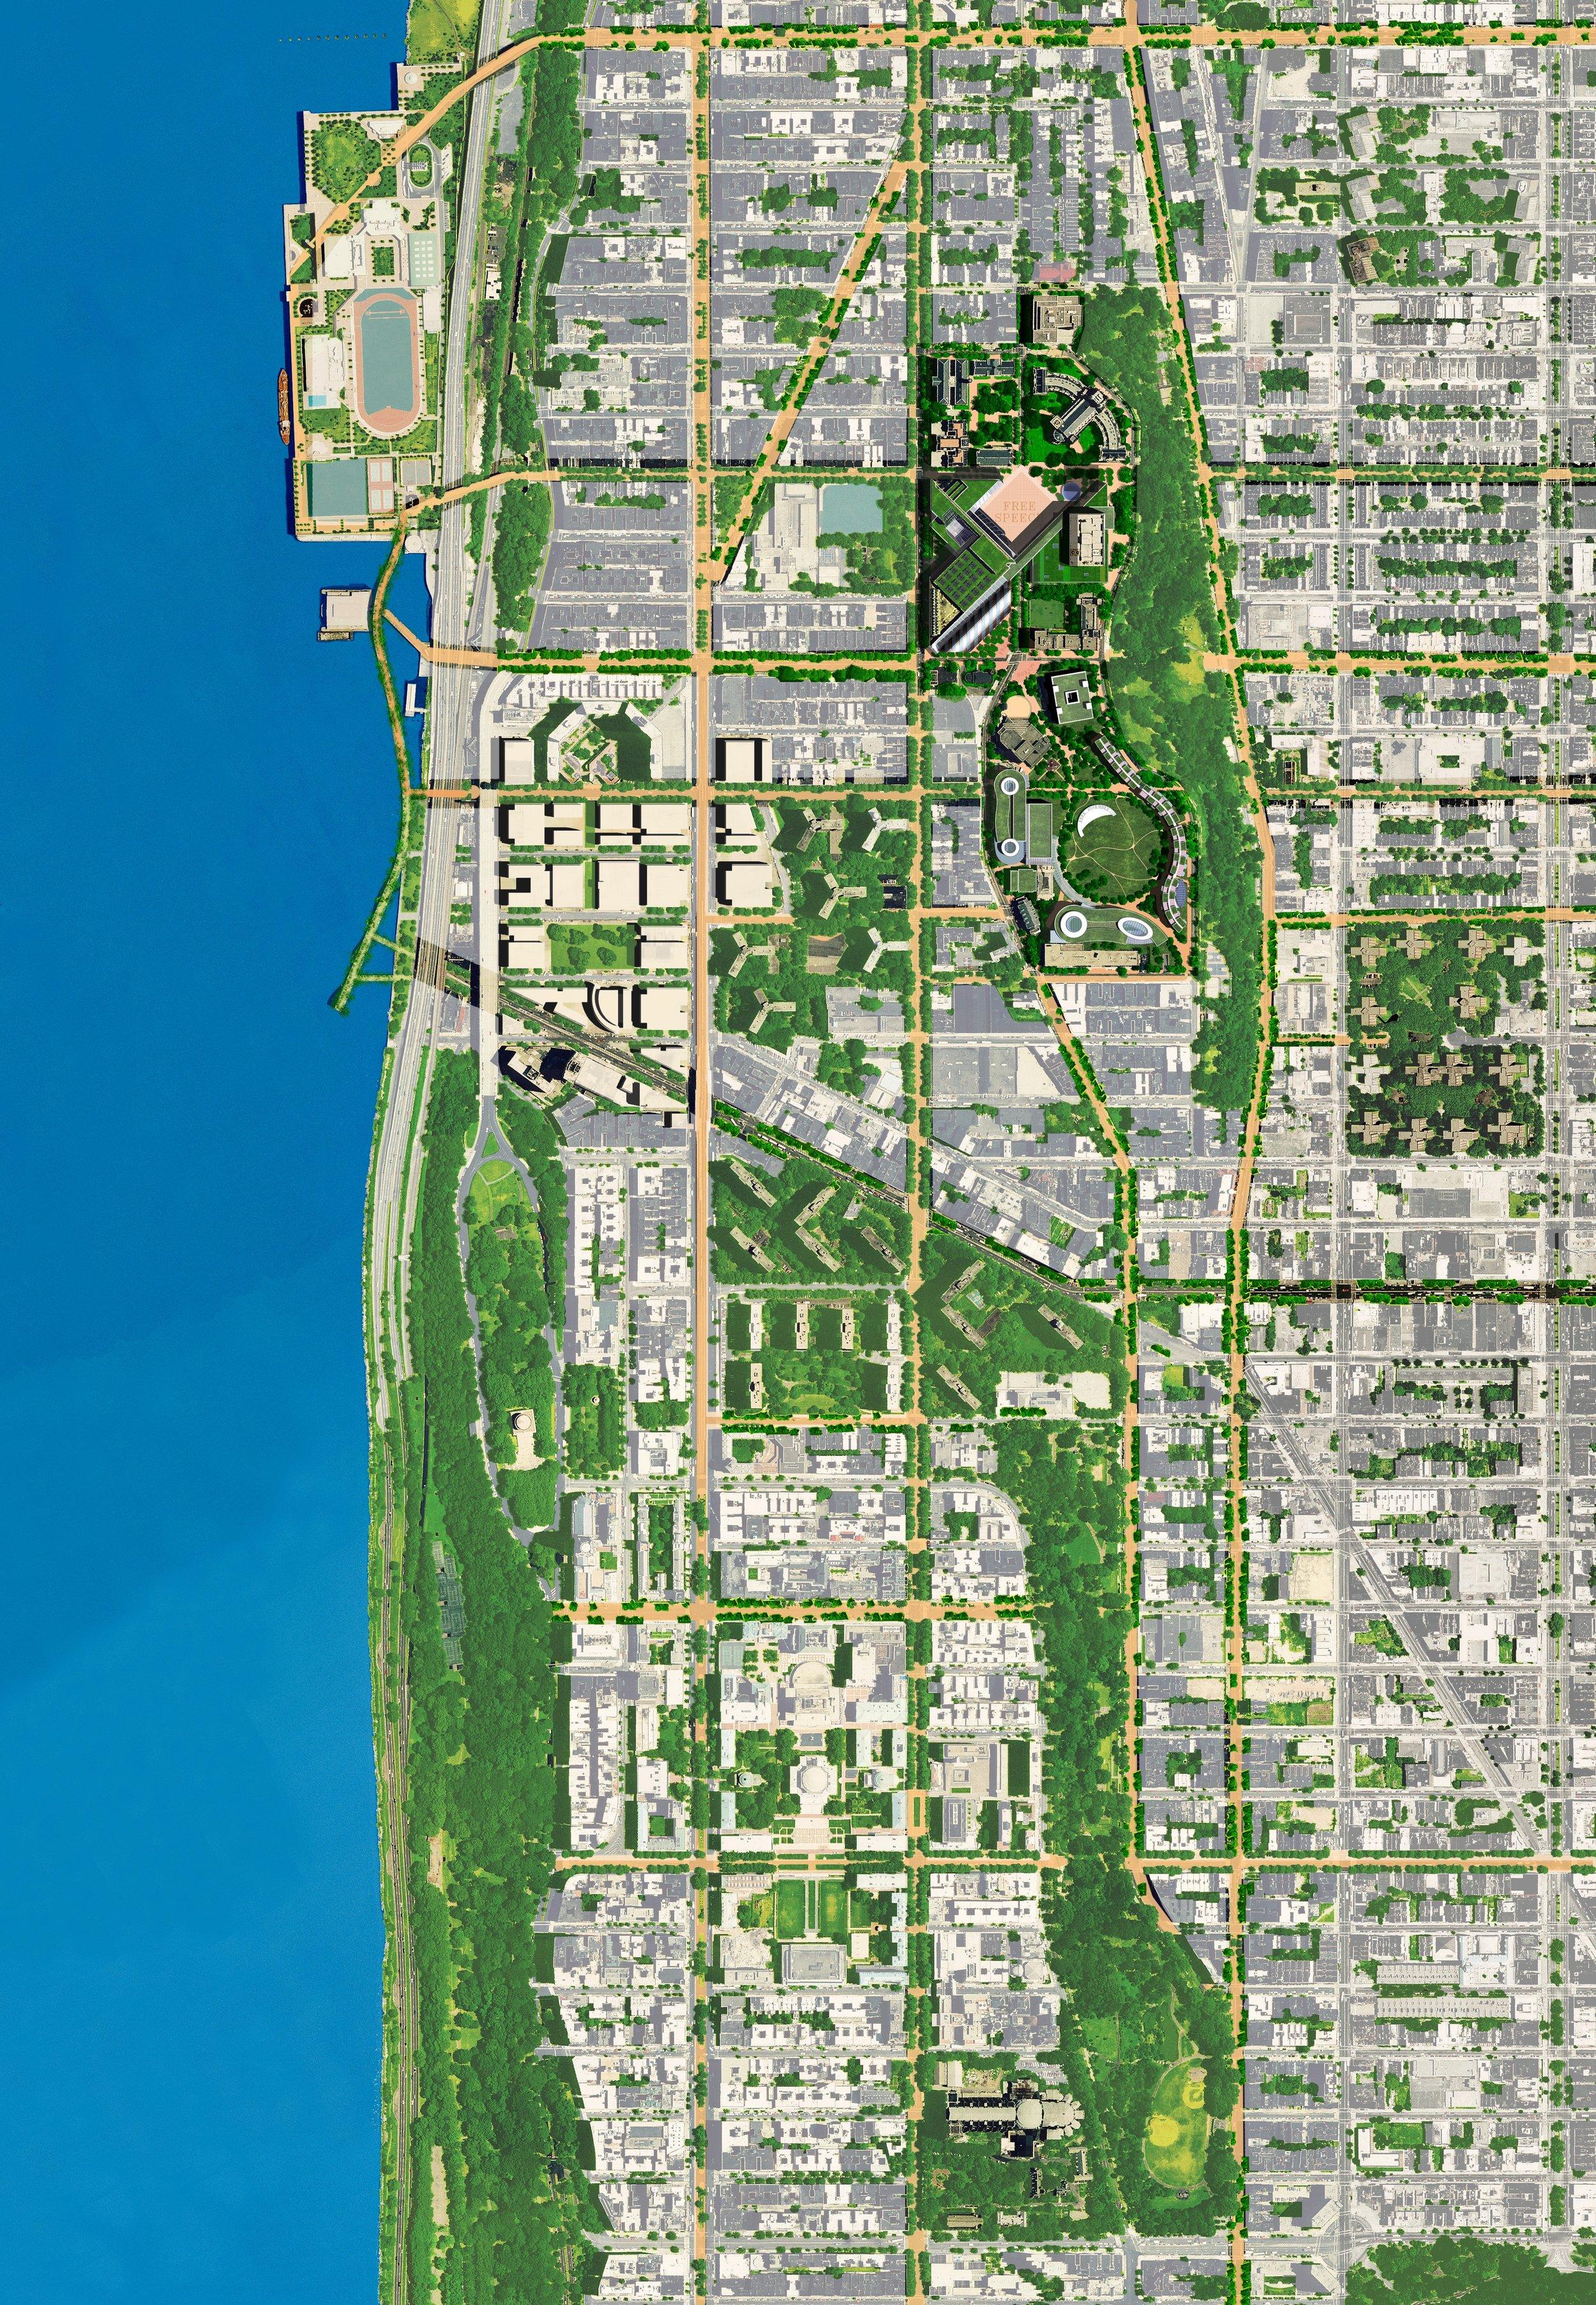 CCNY_Aerial_Area.jpg